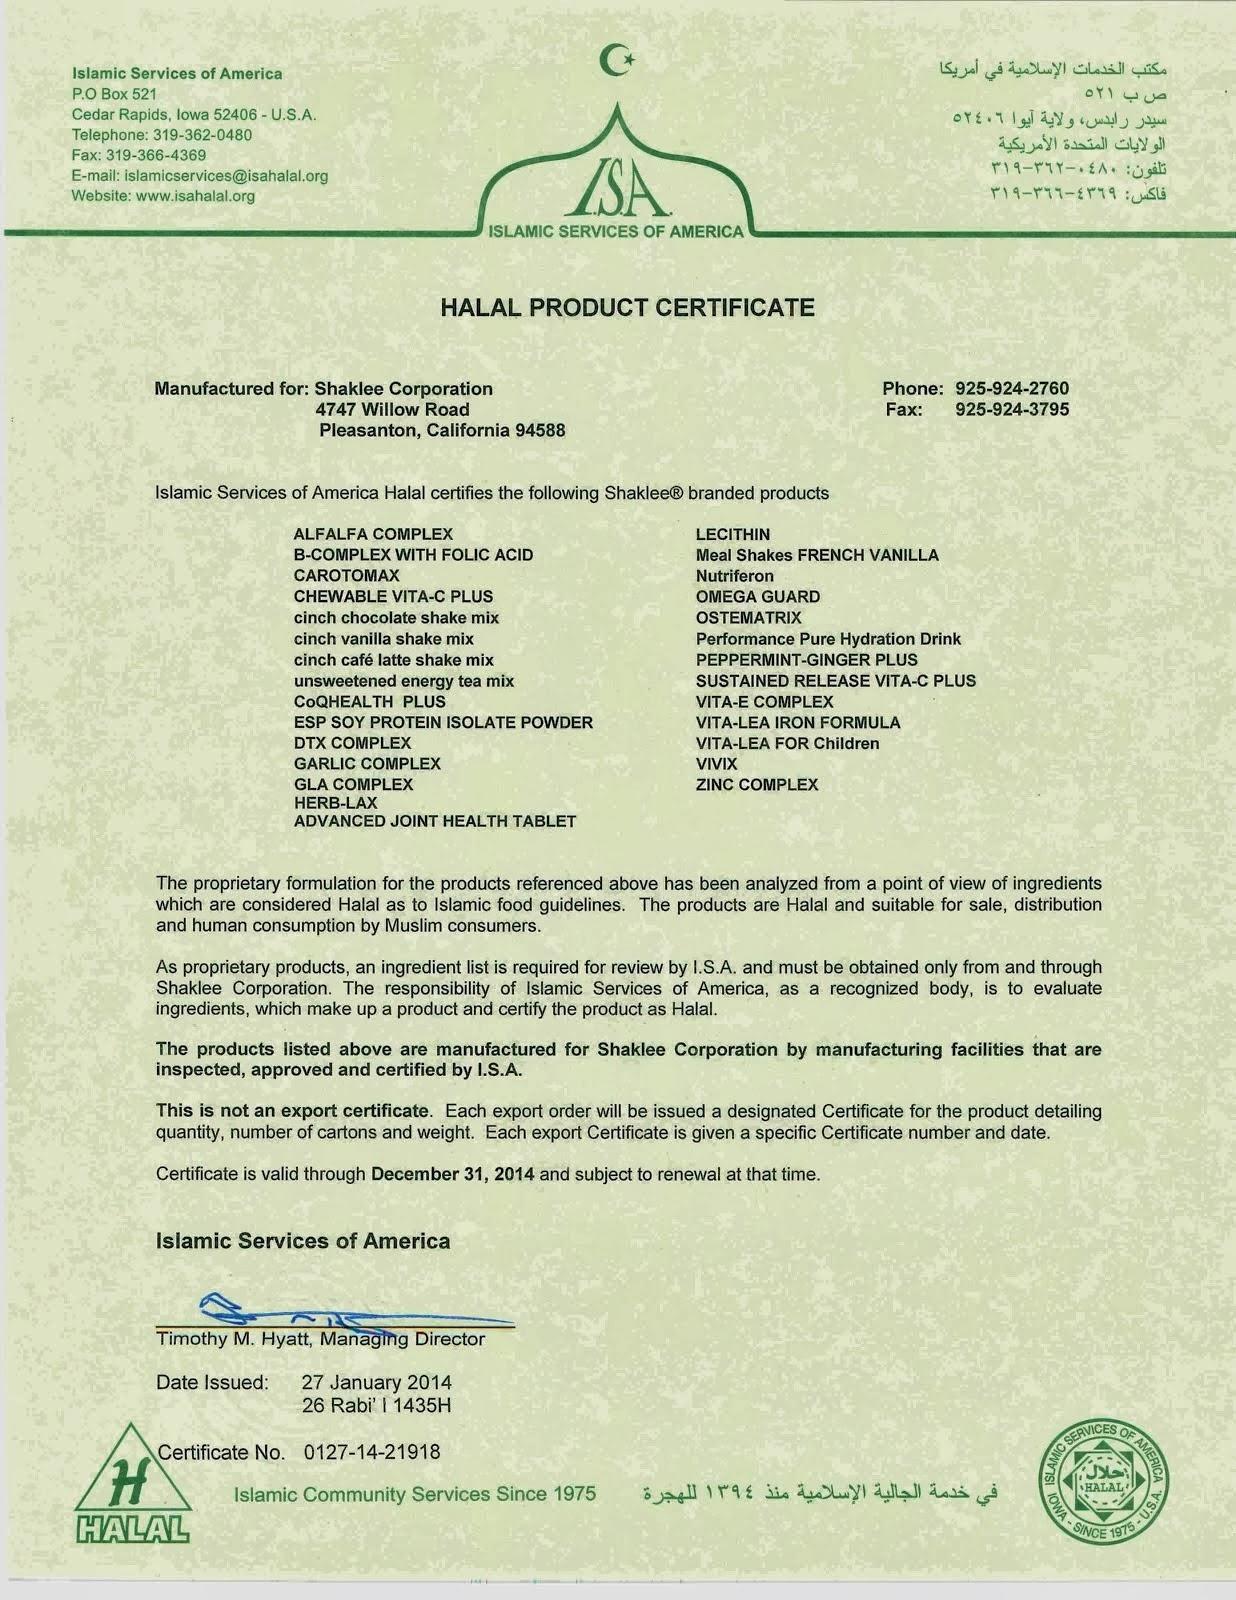 Sijil halal produk Shaklee yang dikeluarkan oleh ISA